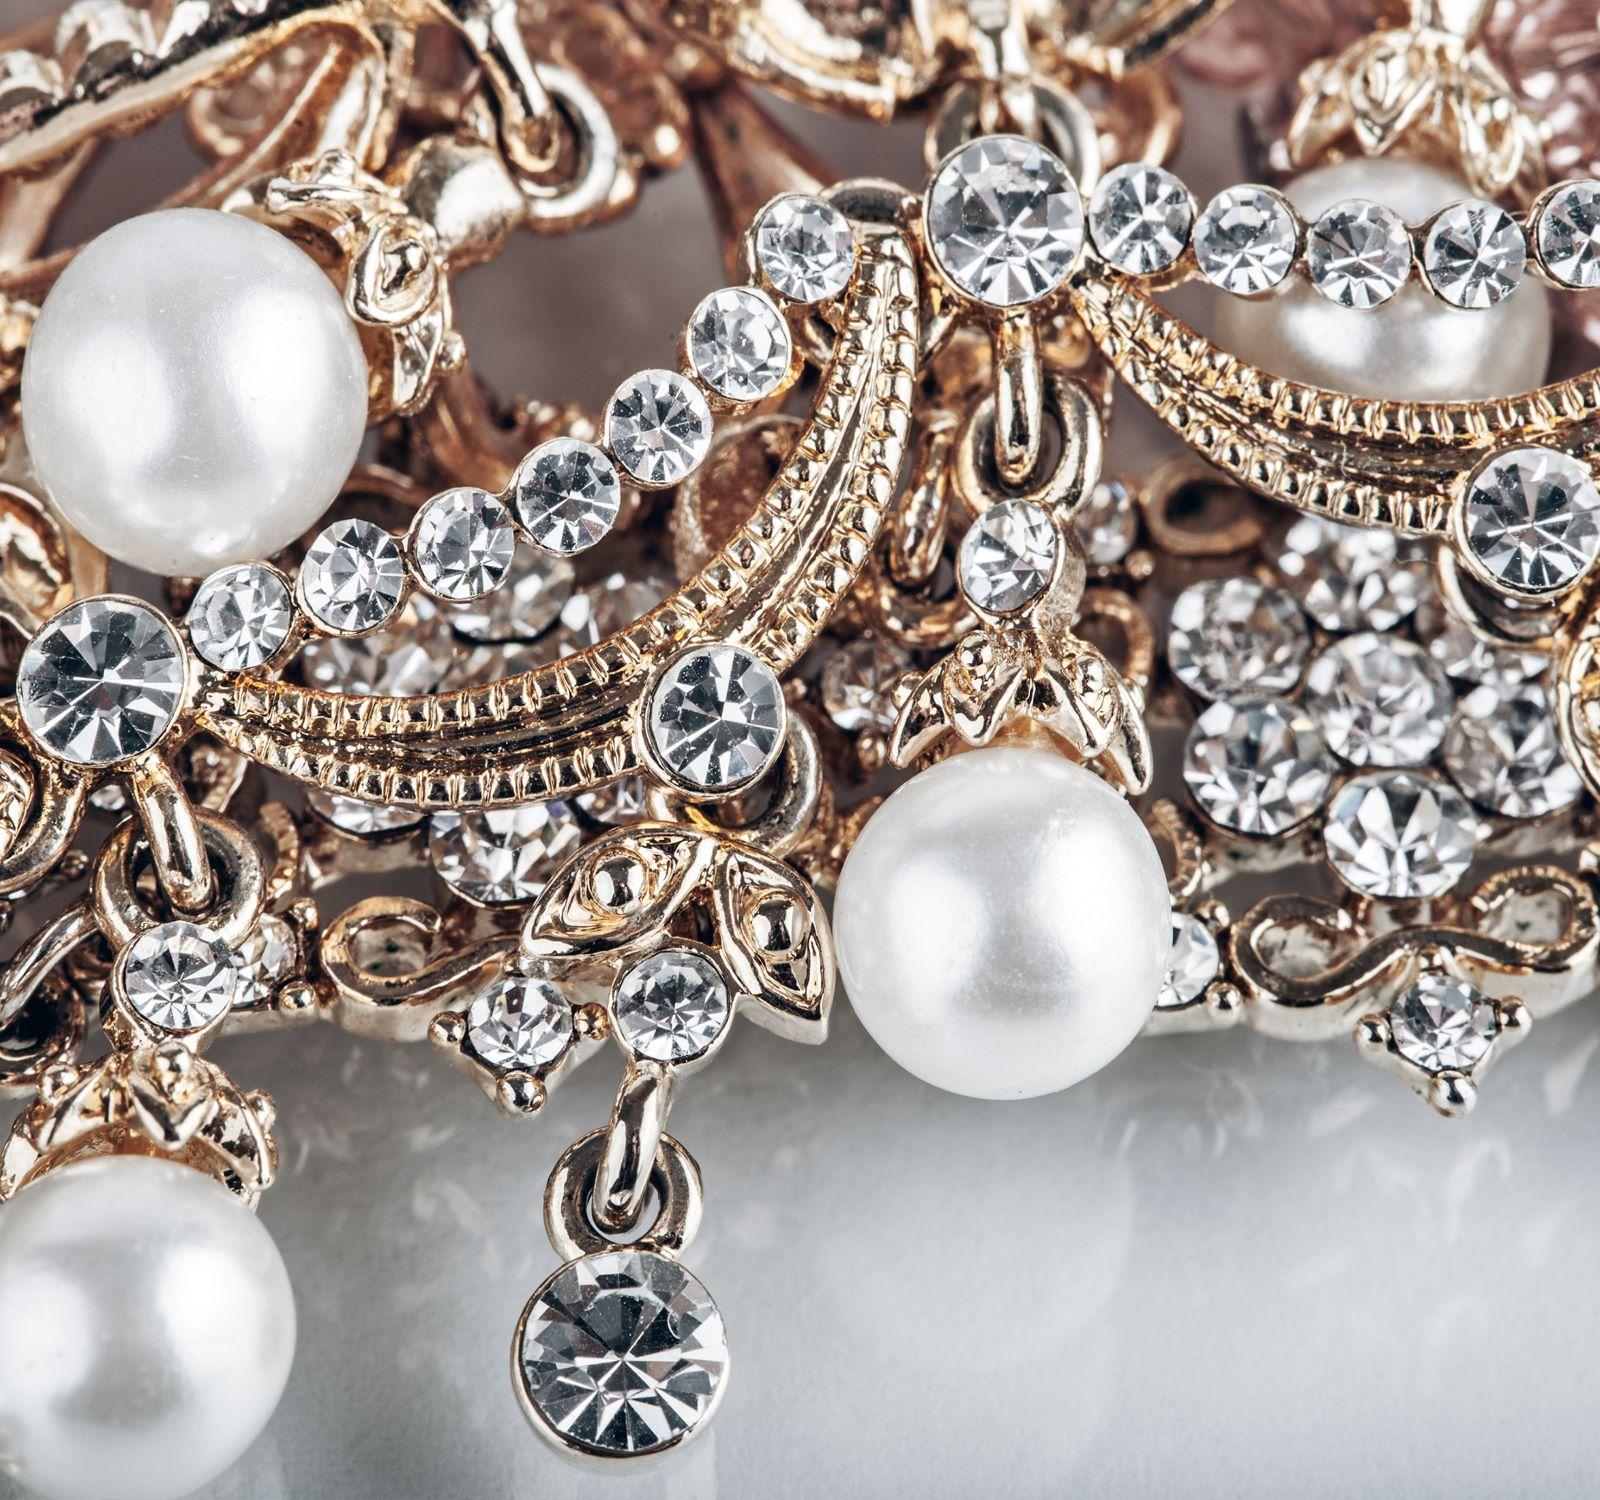 Rosegold jewelry